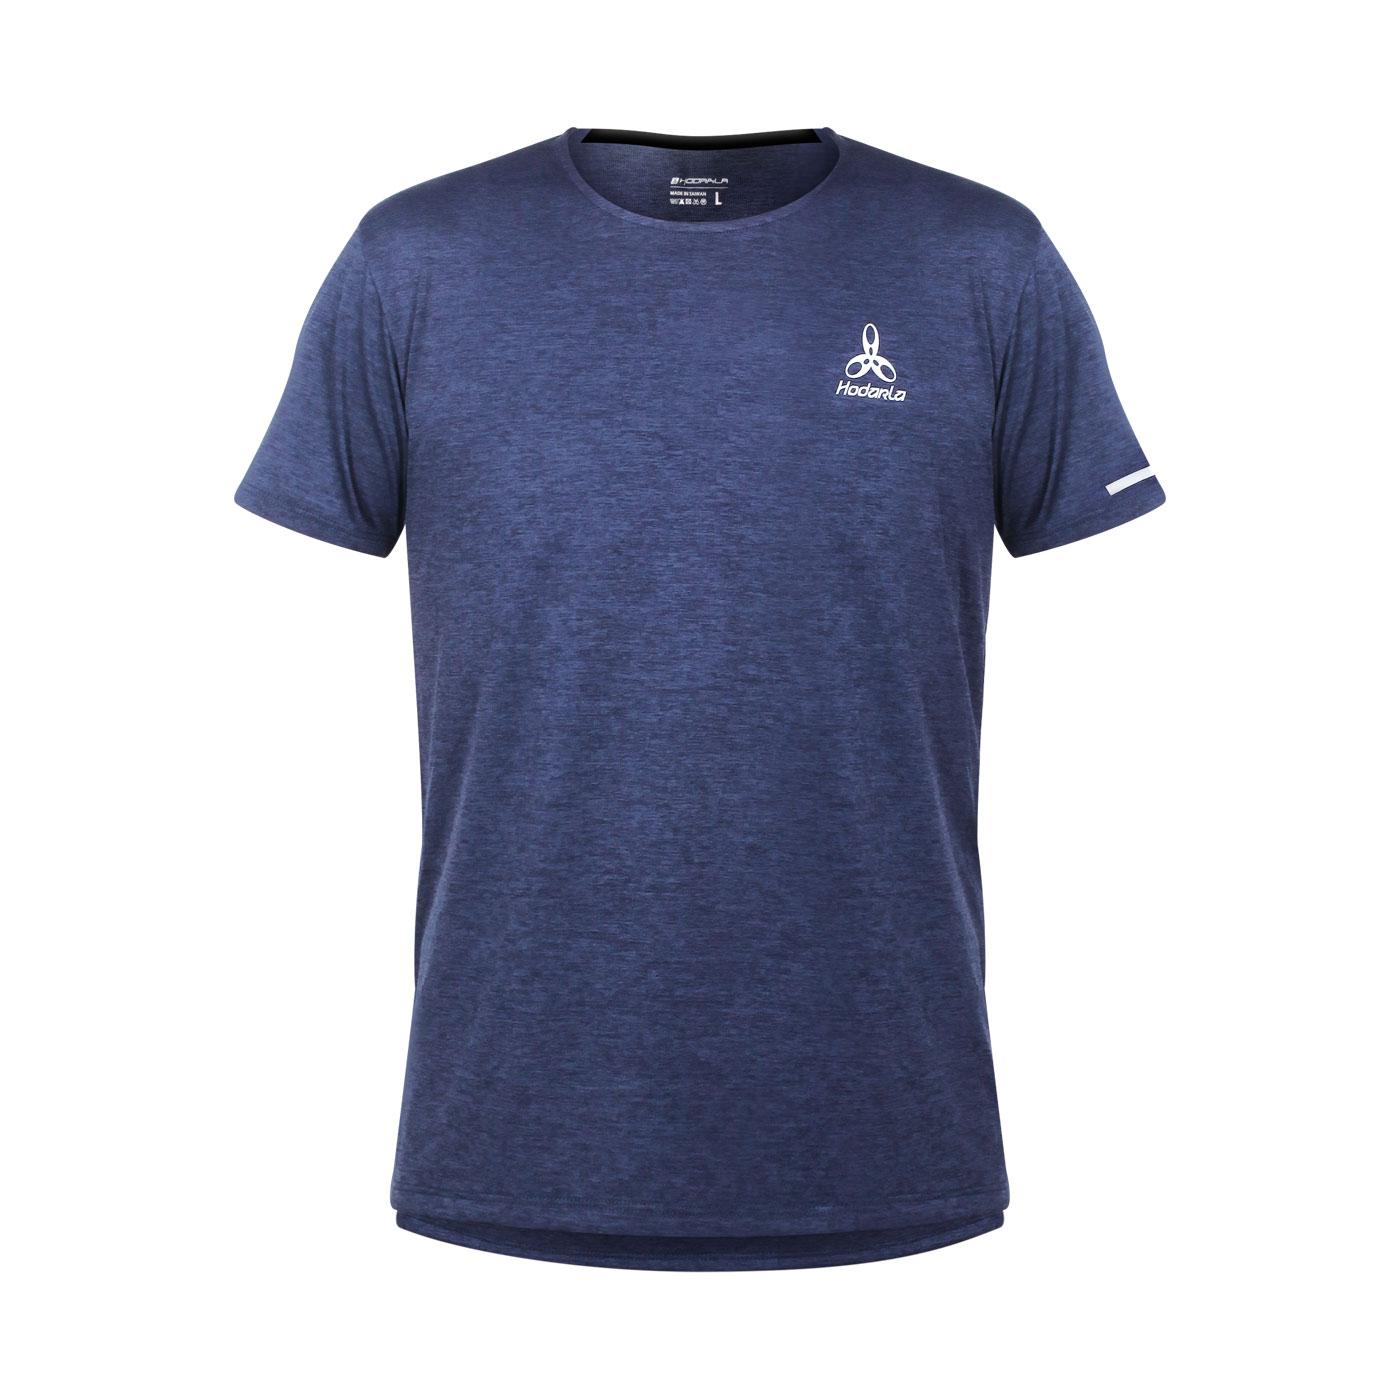 HODARLA 辰光剪接短袖T恤 3161501 - 麻花丈青